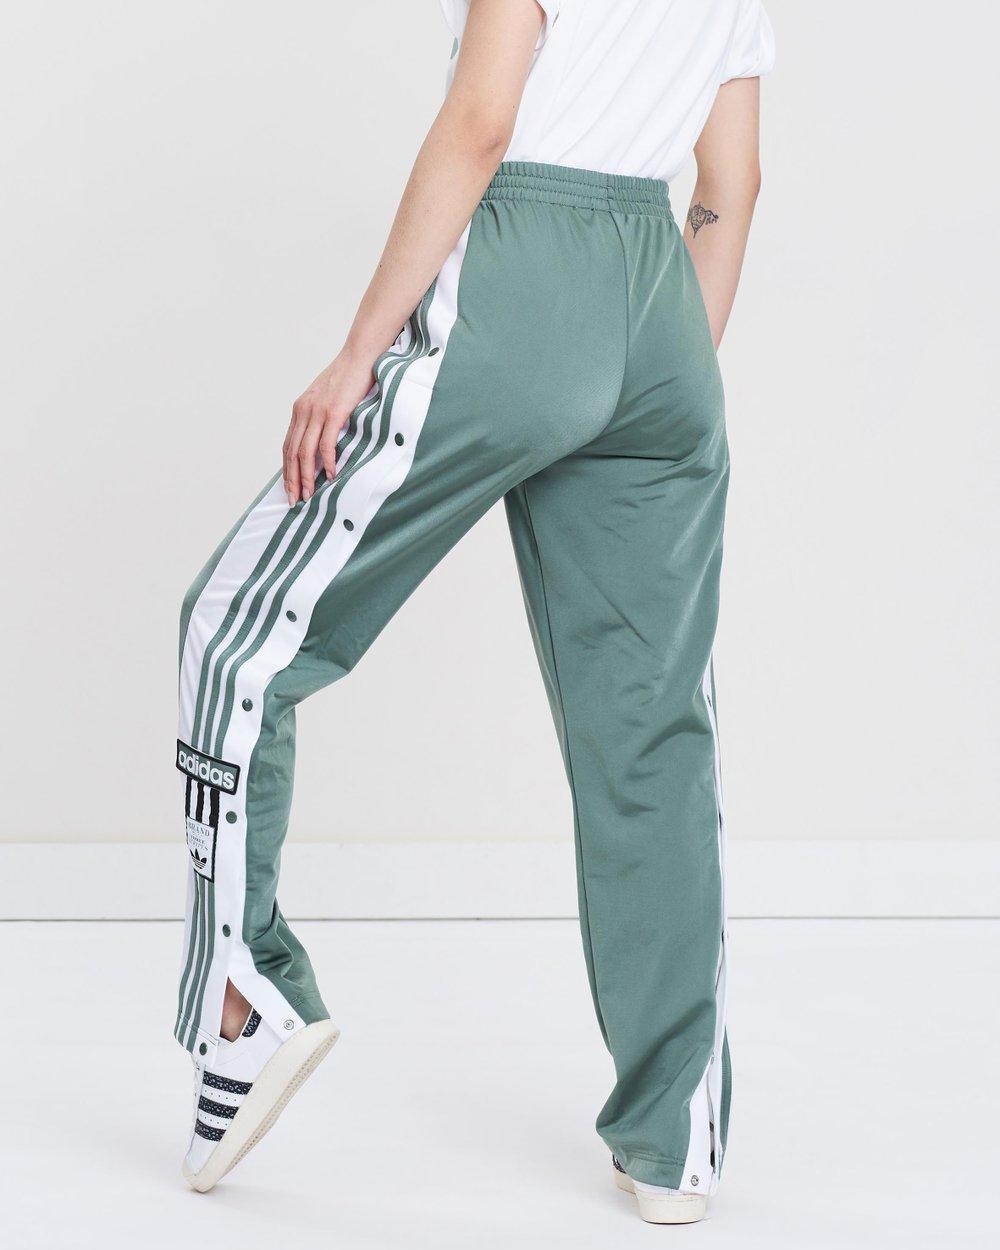 8938992d2c2a9 Adibreak Pants by adidas Originals Online | THE ICONIC | Australia